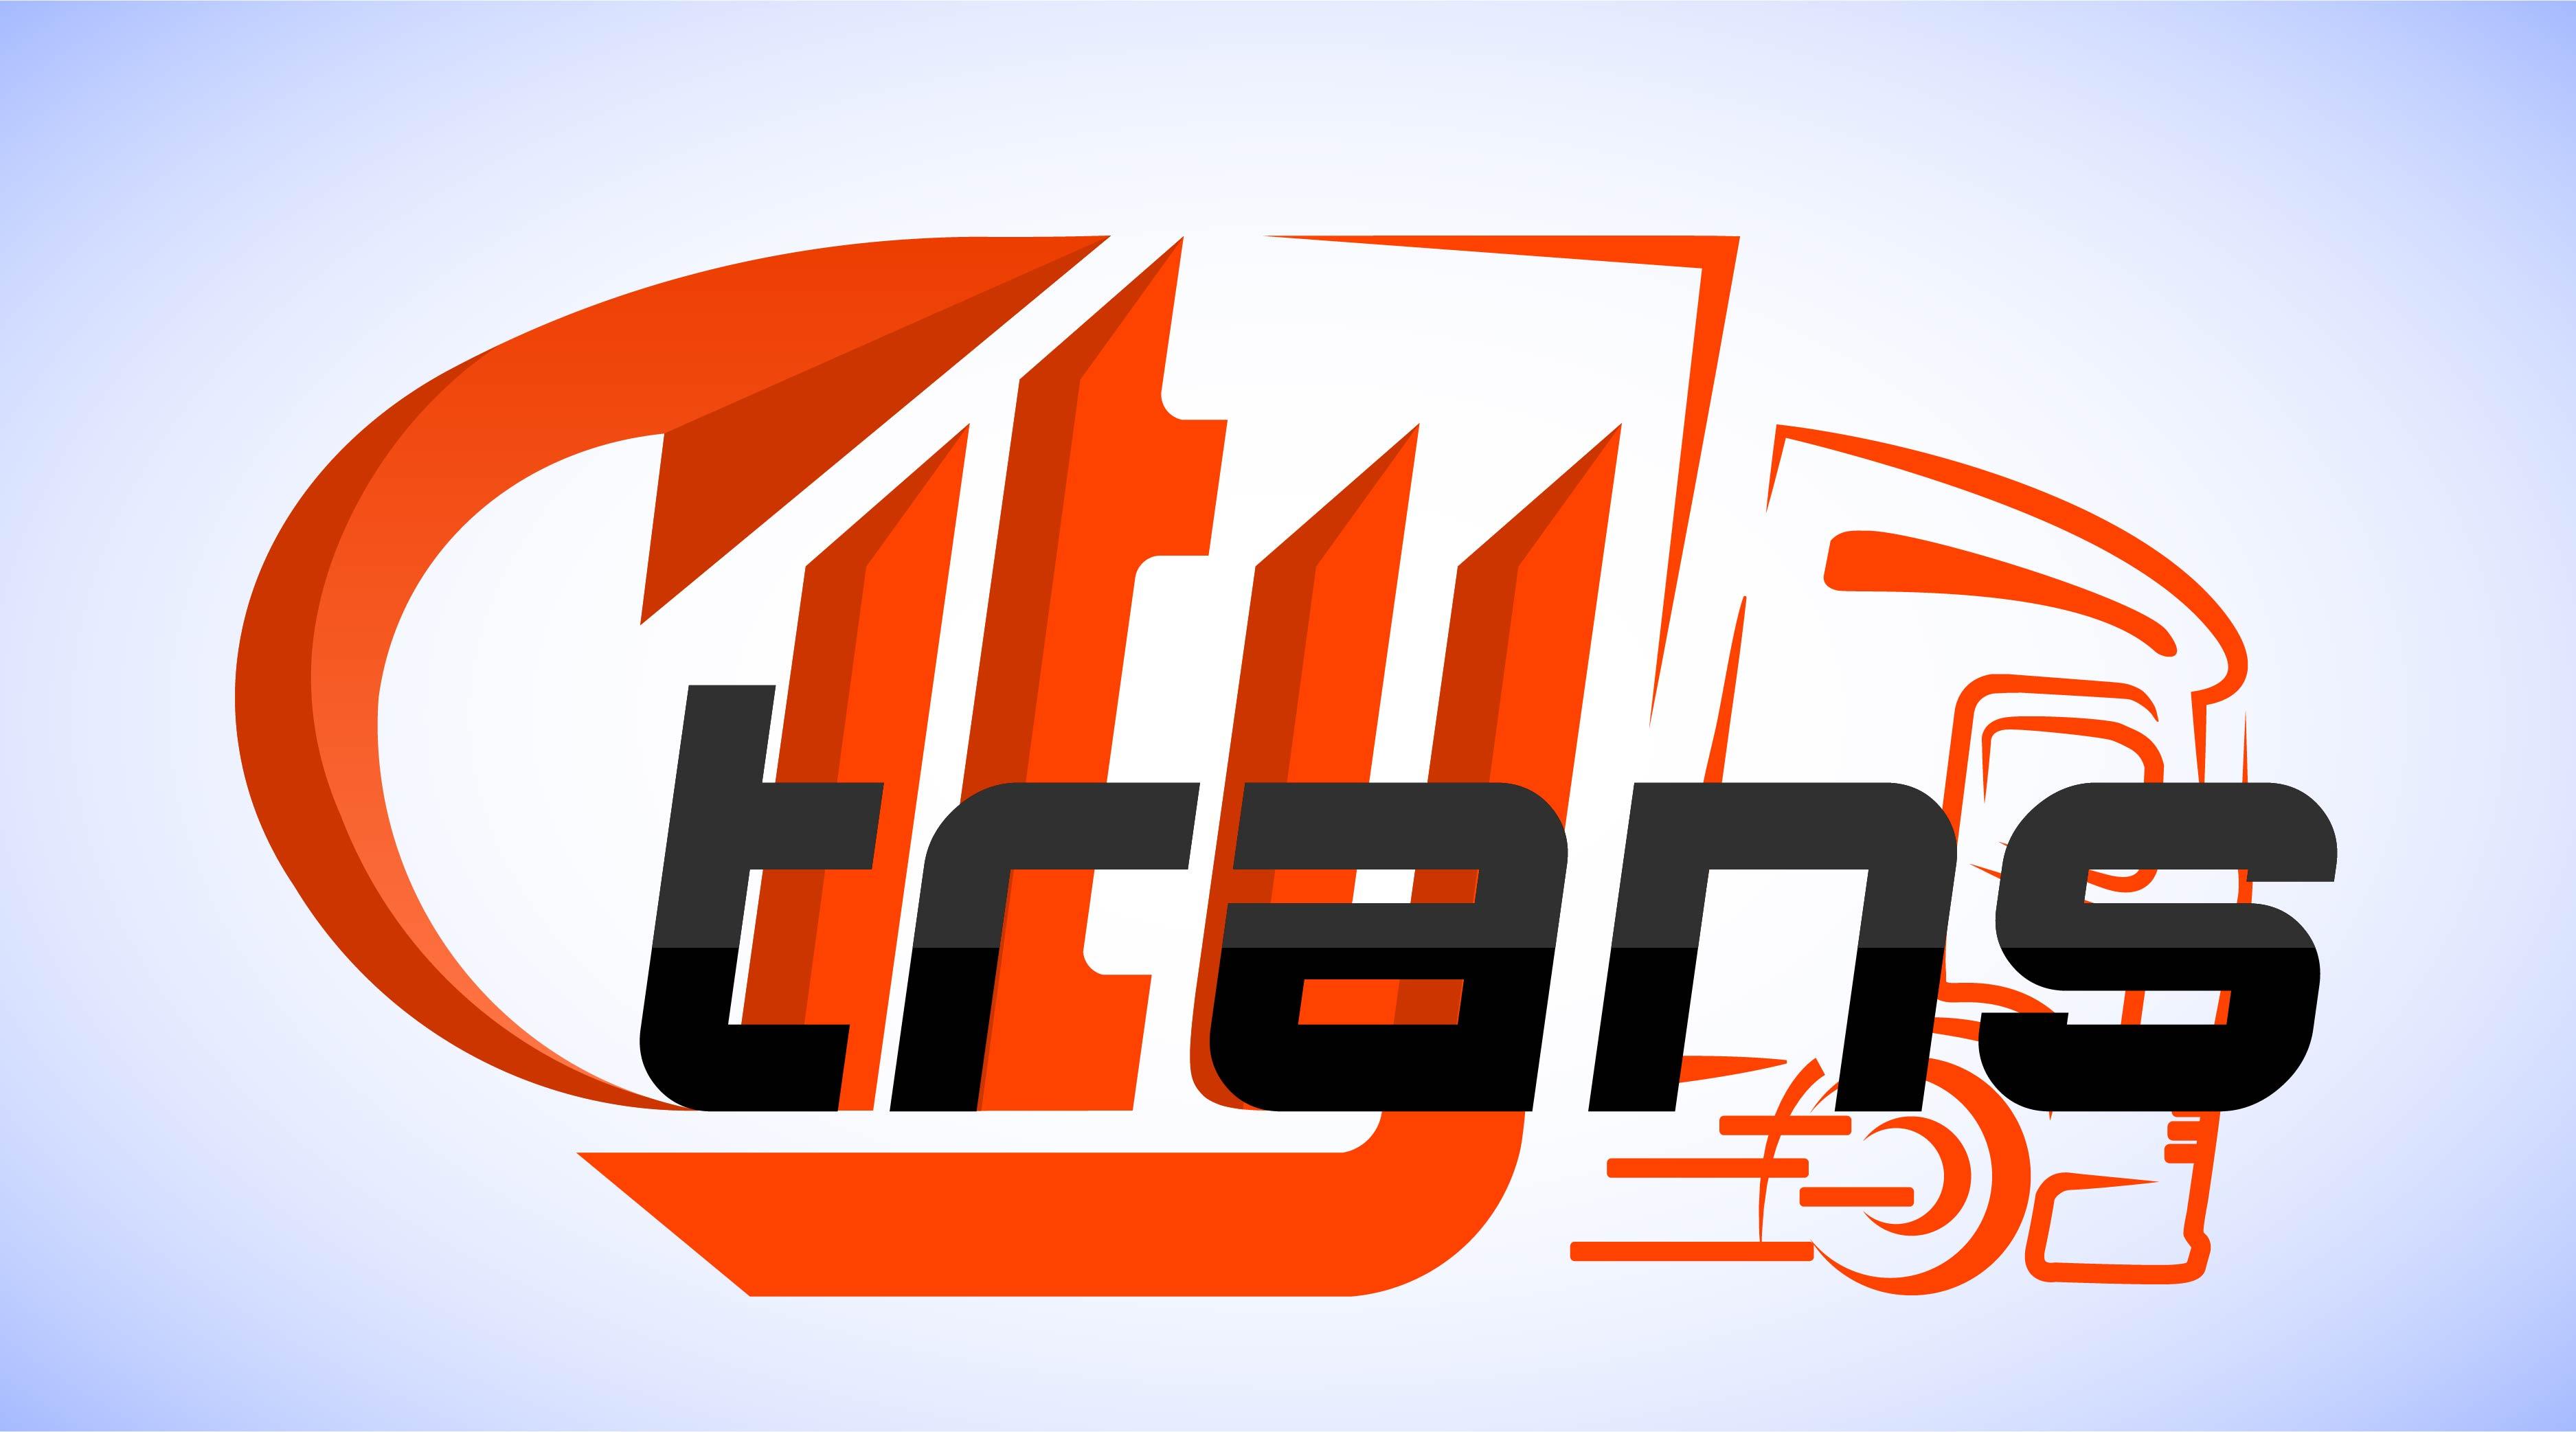 Разработка Логотипа транспортной компании фото f_5975e6fbf436aa43.jpg